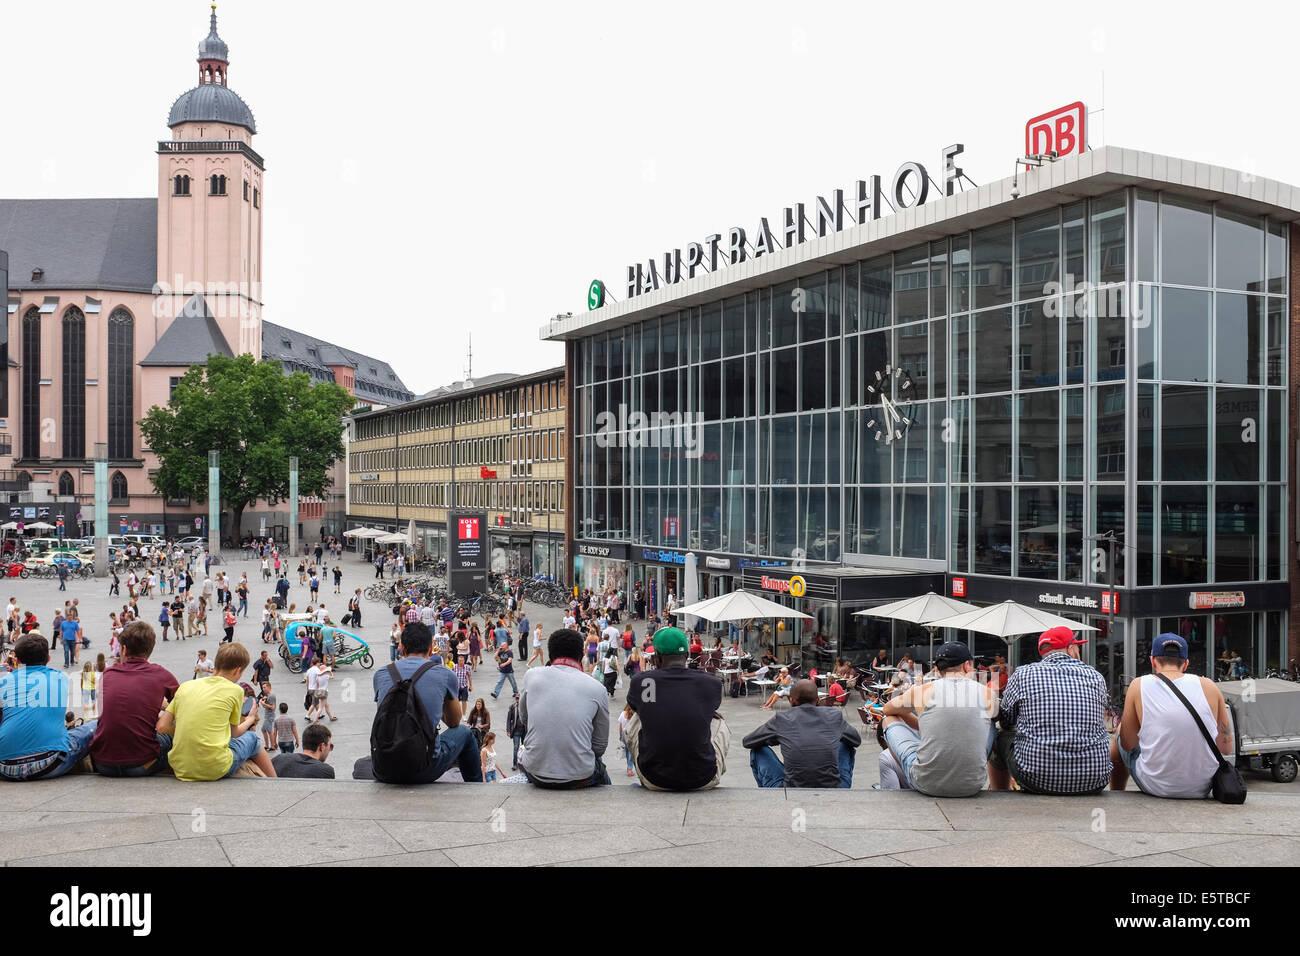 Universitätsbibliothek Regensburg - Universität Regensburg